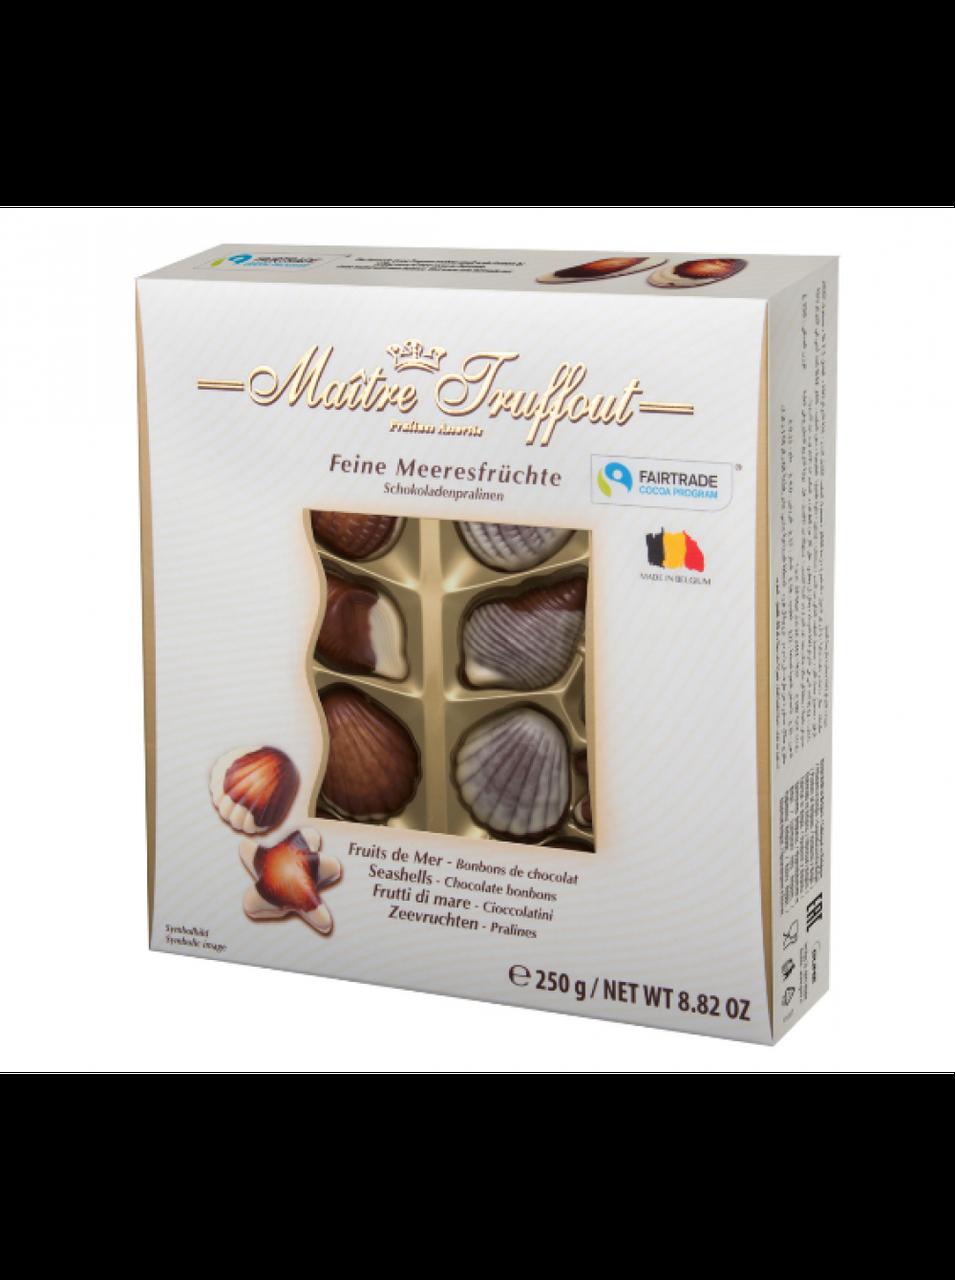 Шоколадные конфеты в коробке Maitre Truffout Feine Meeresfruchte, 250г Австрия